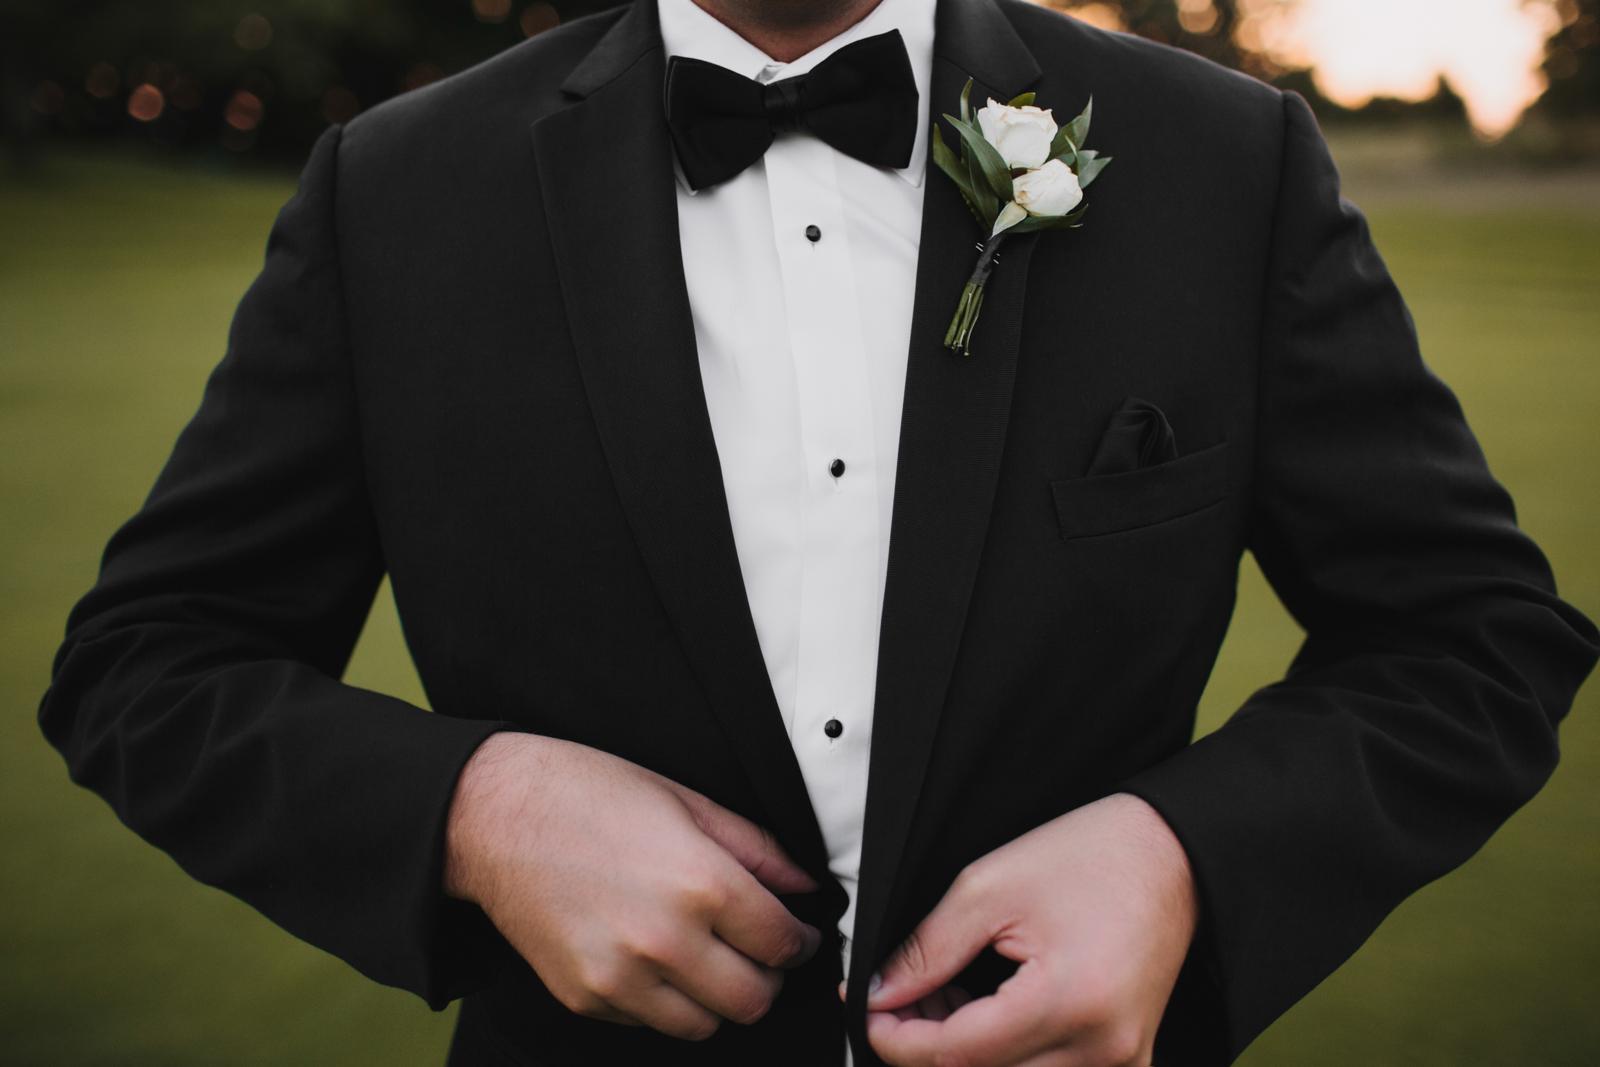 Northern Michigan Grand Traverse Resort Black Tie Wedding Photographer - Codee and Aaron-024.jpg